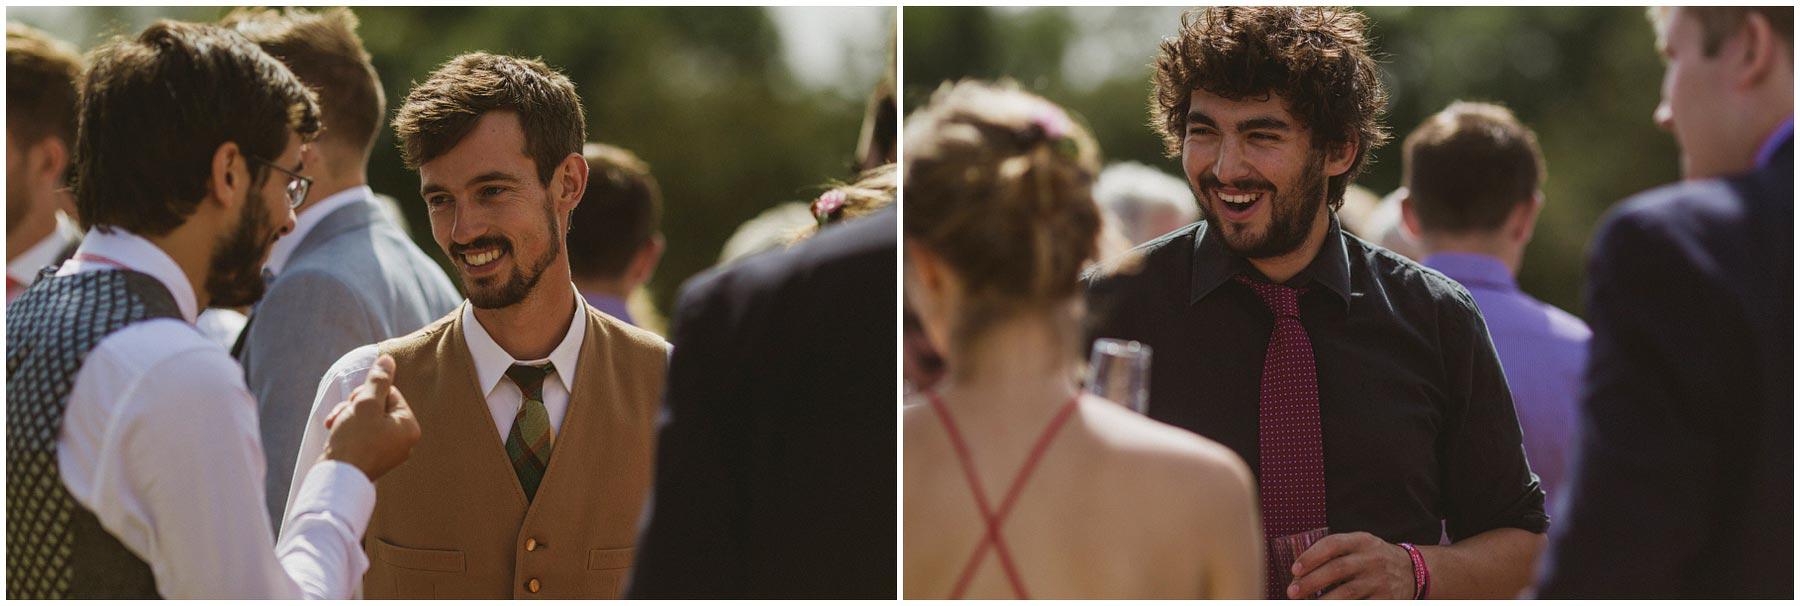 Kent-Festival-Tipi-wedding-photography_0095